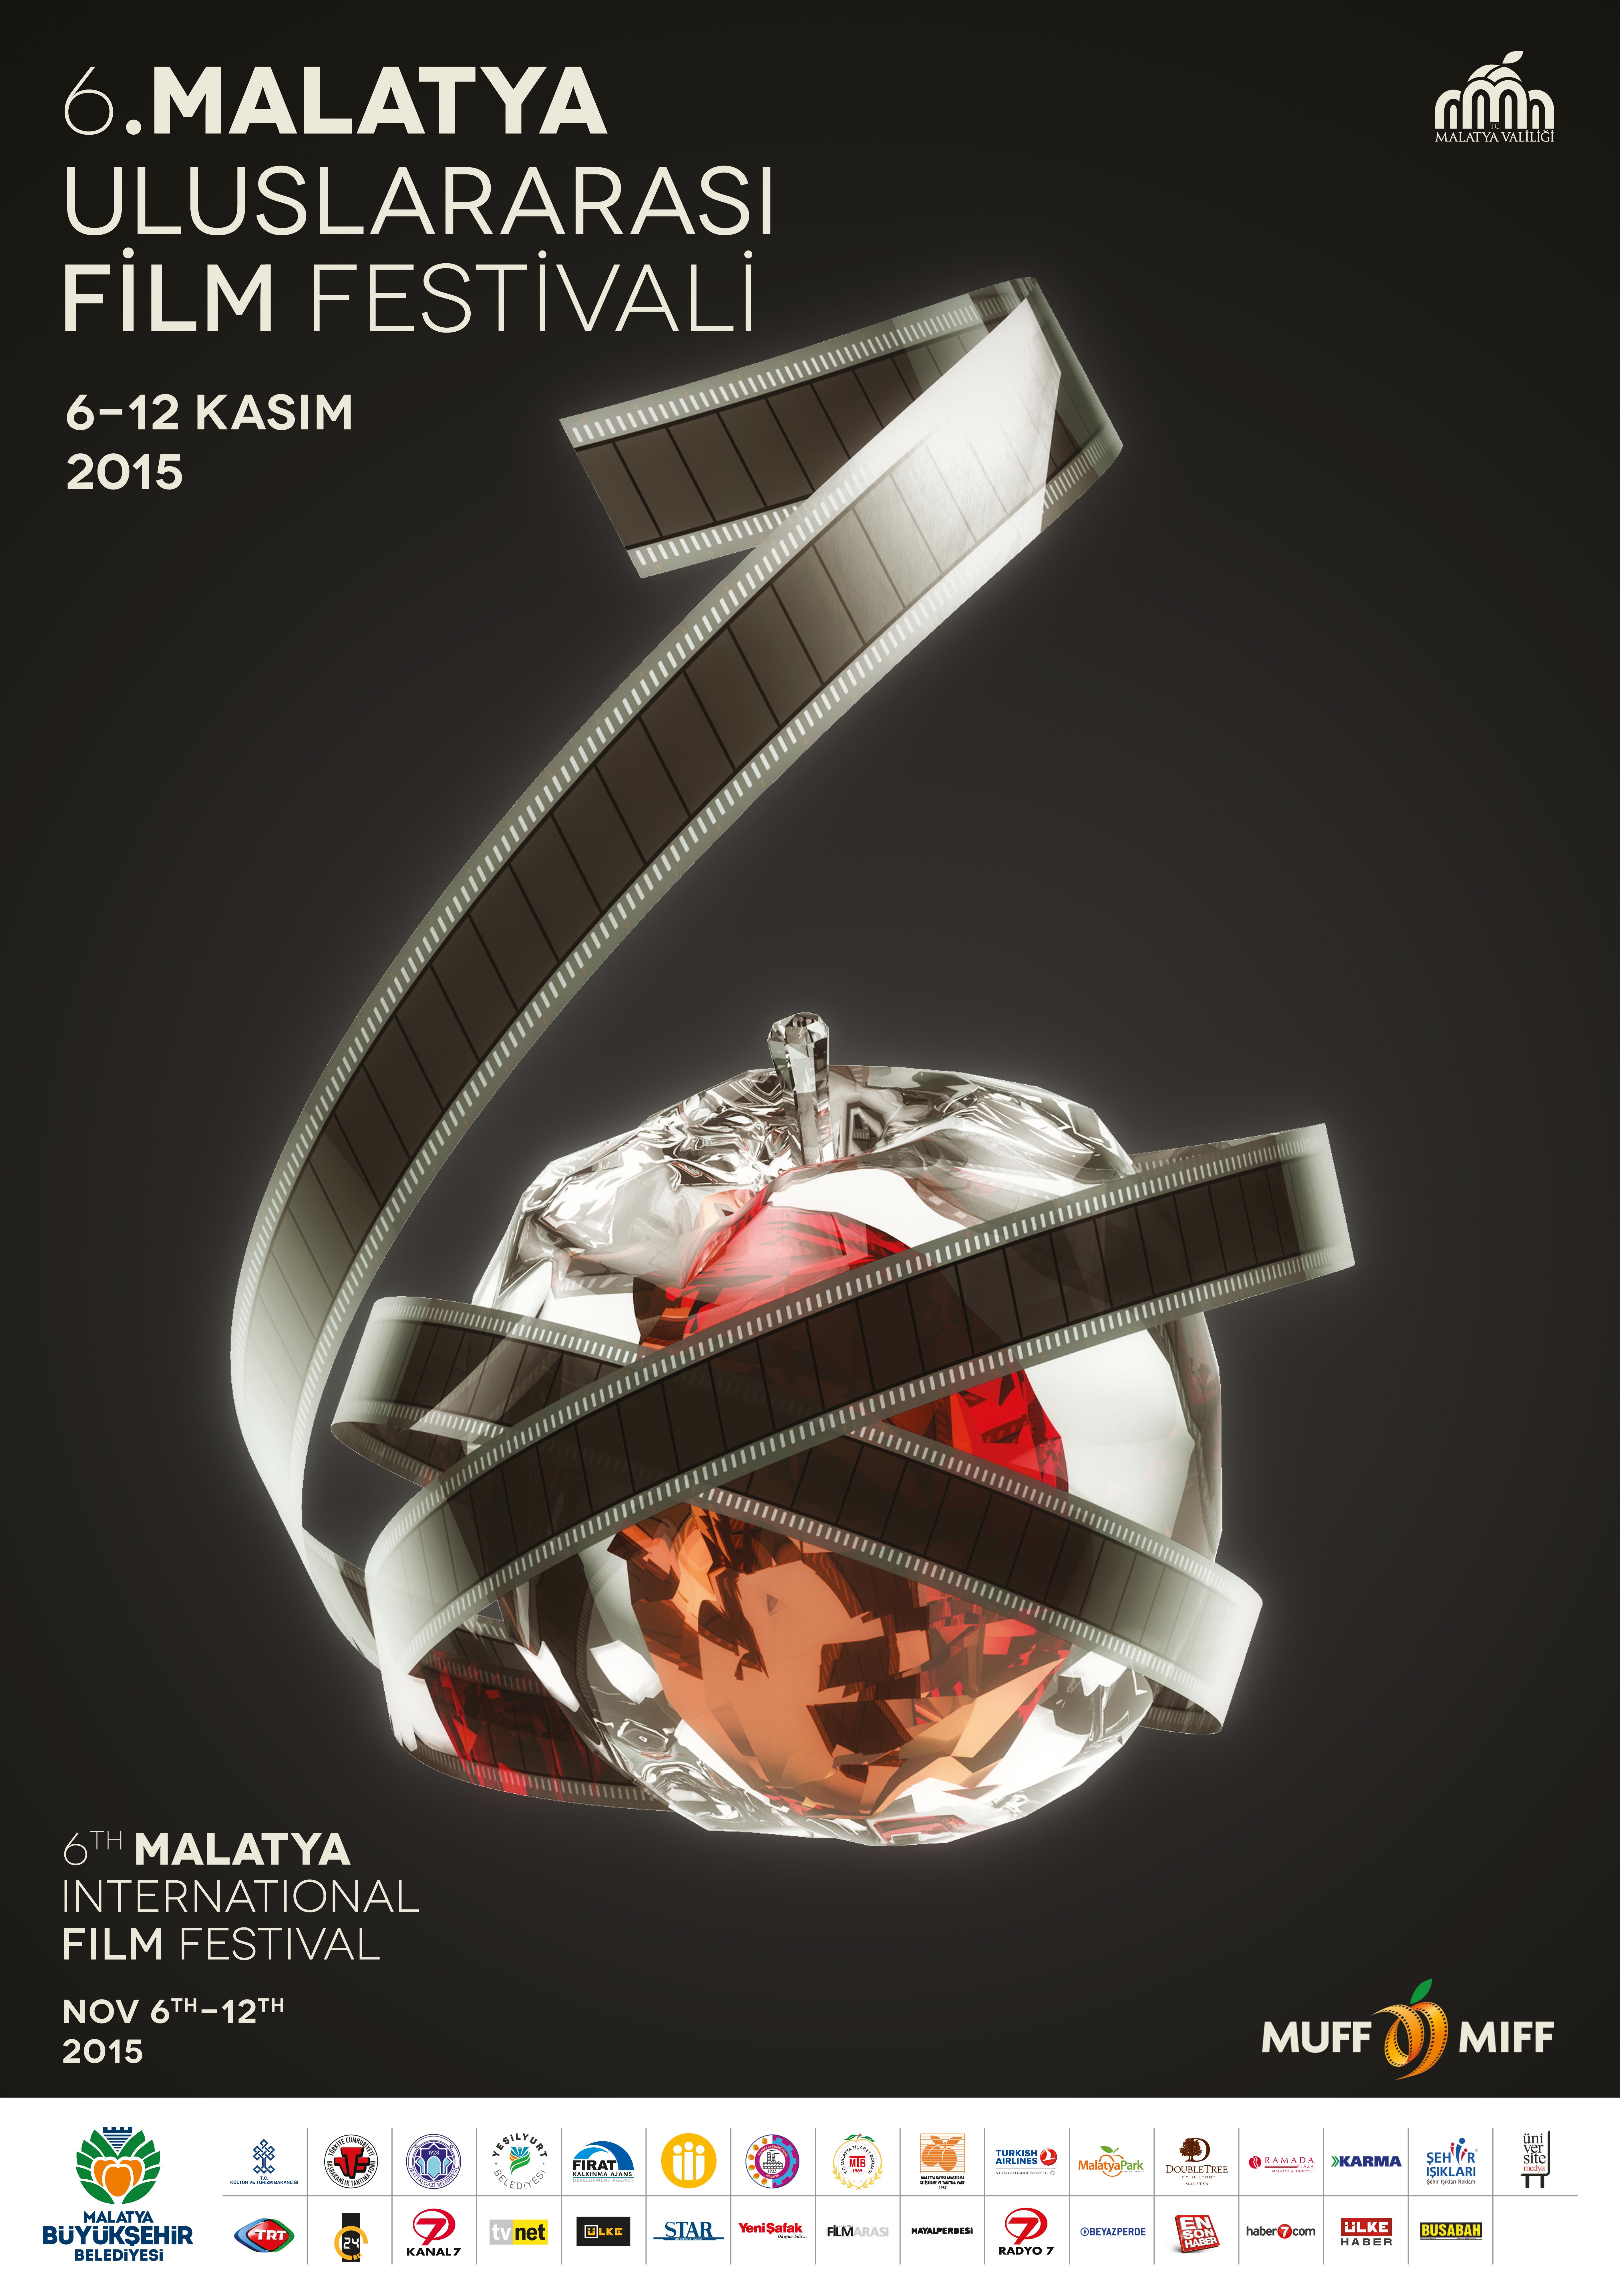 malatya film festivali vikipedi